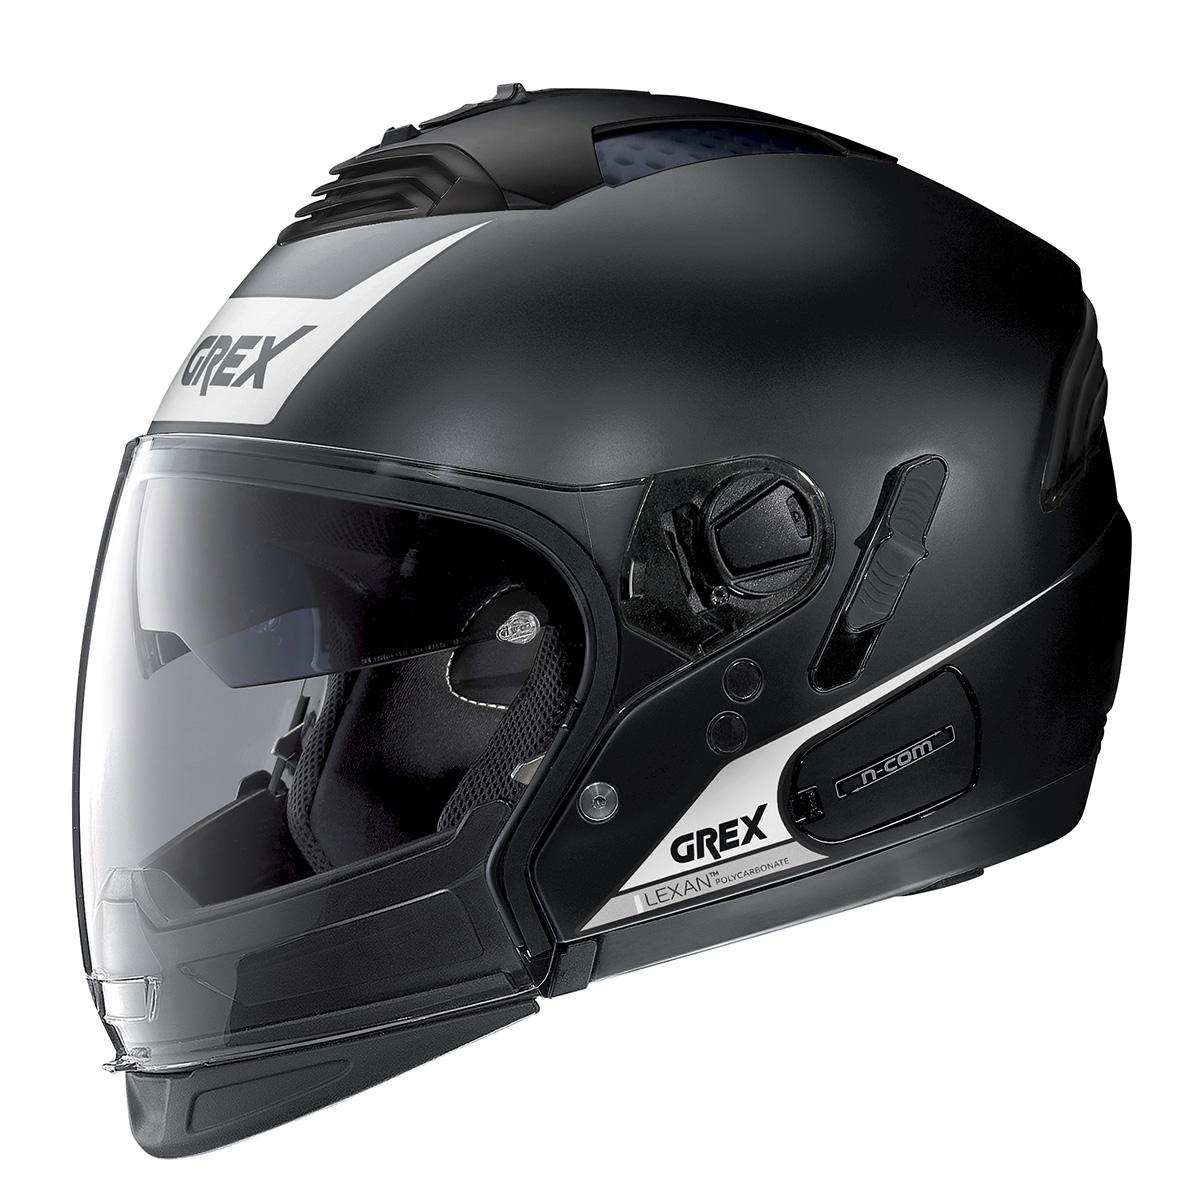 Moto helma Grex G4.2 PRO Vivid N-Com Flat Black 31